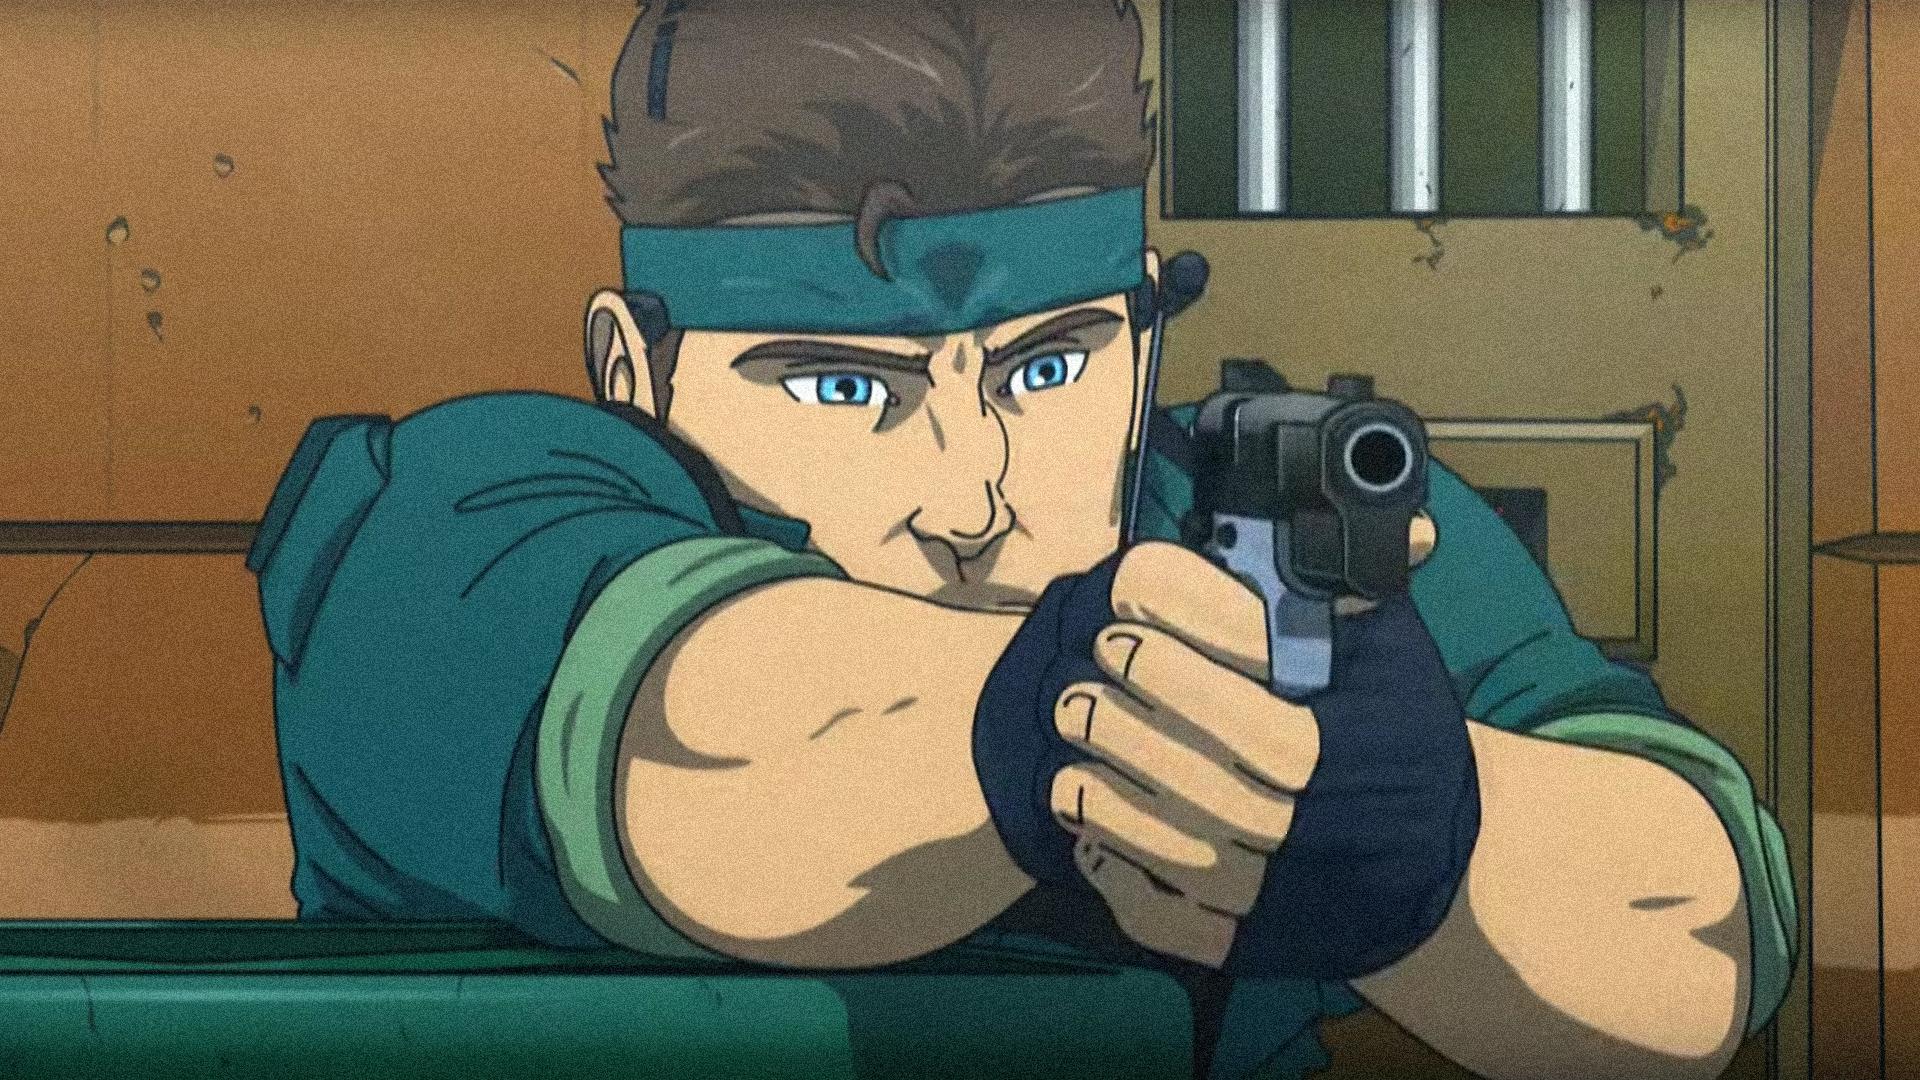 Snake apuntando pistola